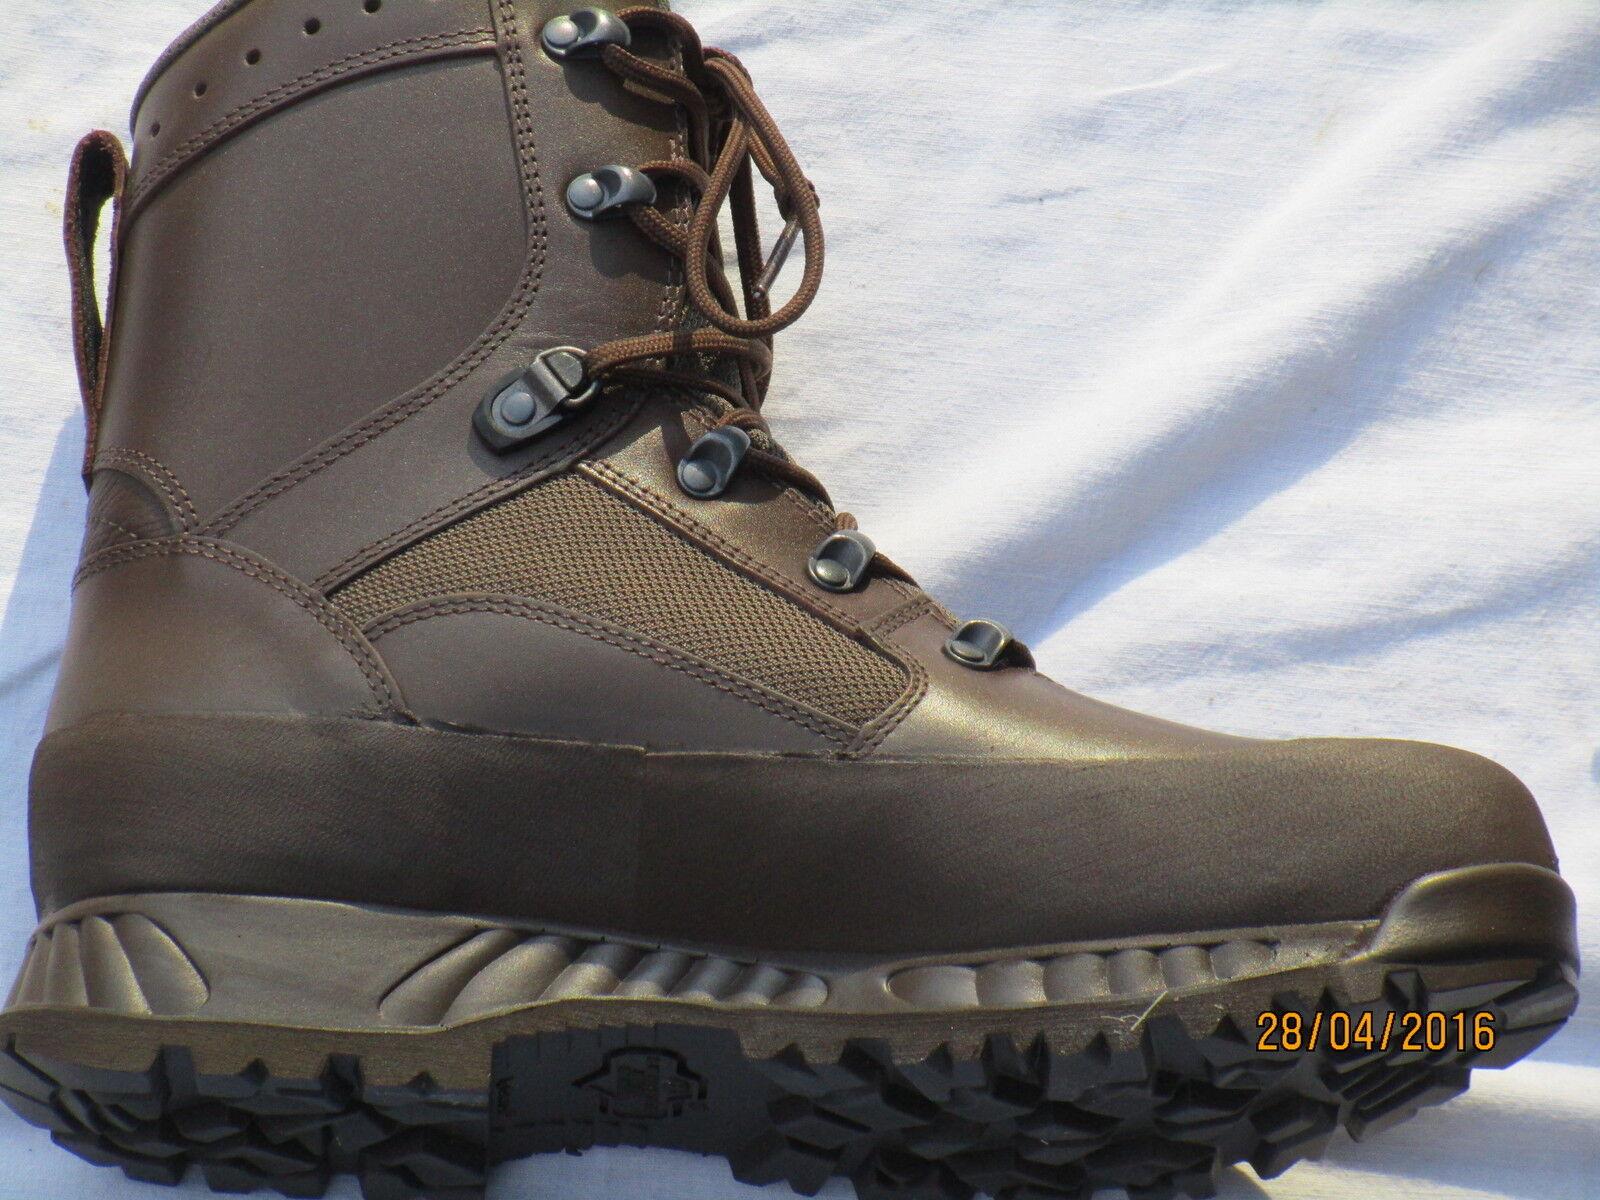 Haix ,Botas Combat High EU42 Liability macho,marrón,MTP,goretex,talla 8 (M) EU42 High / 2c2512